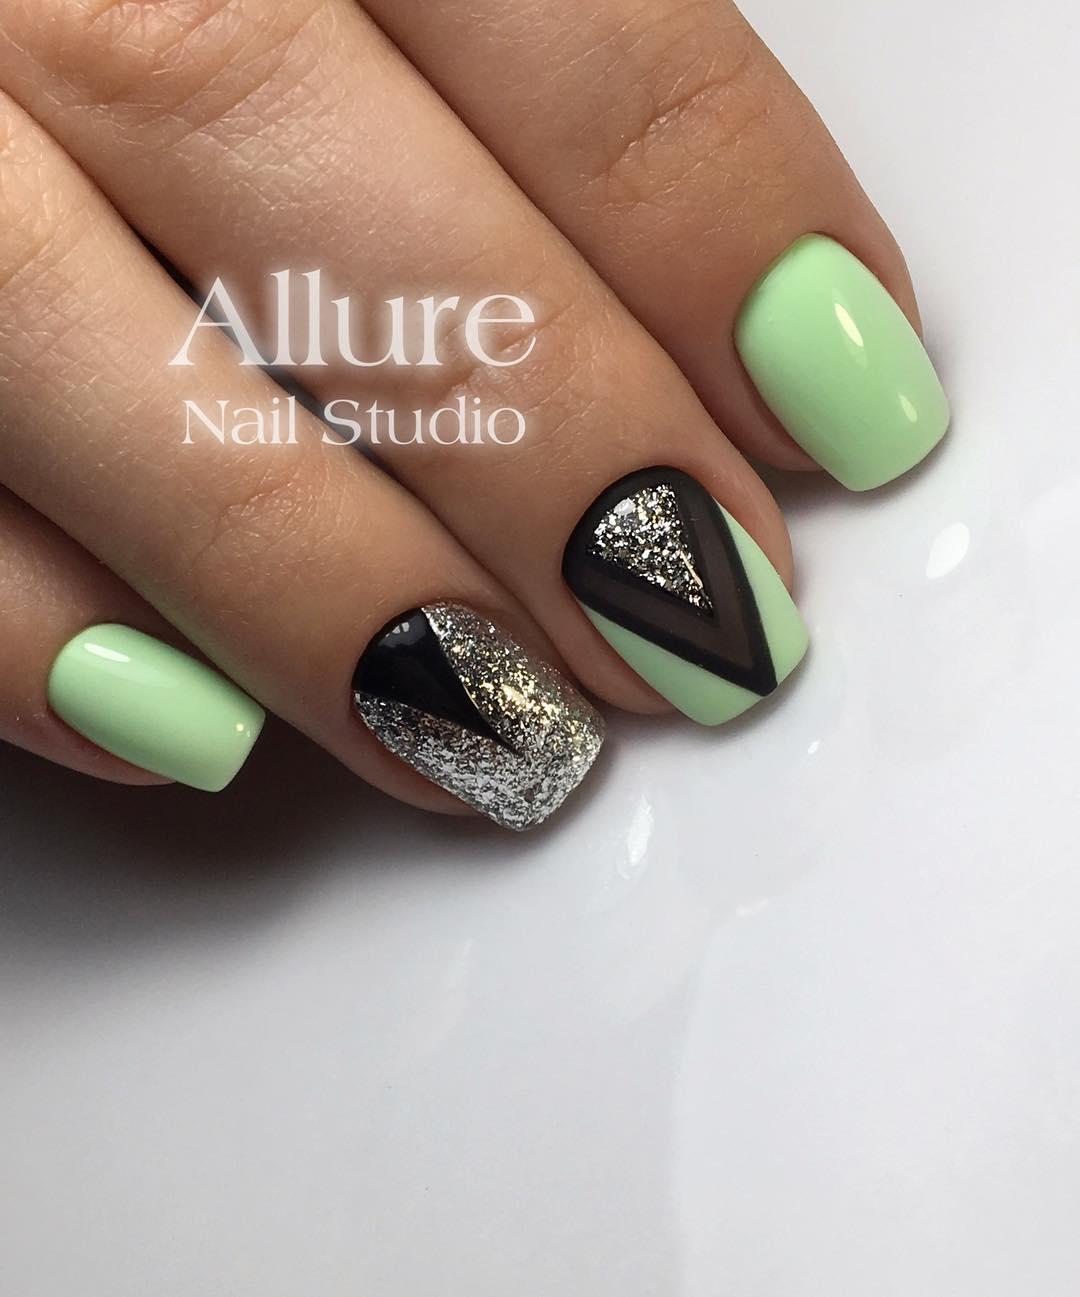 allure_nail_studio-4.jpg